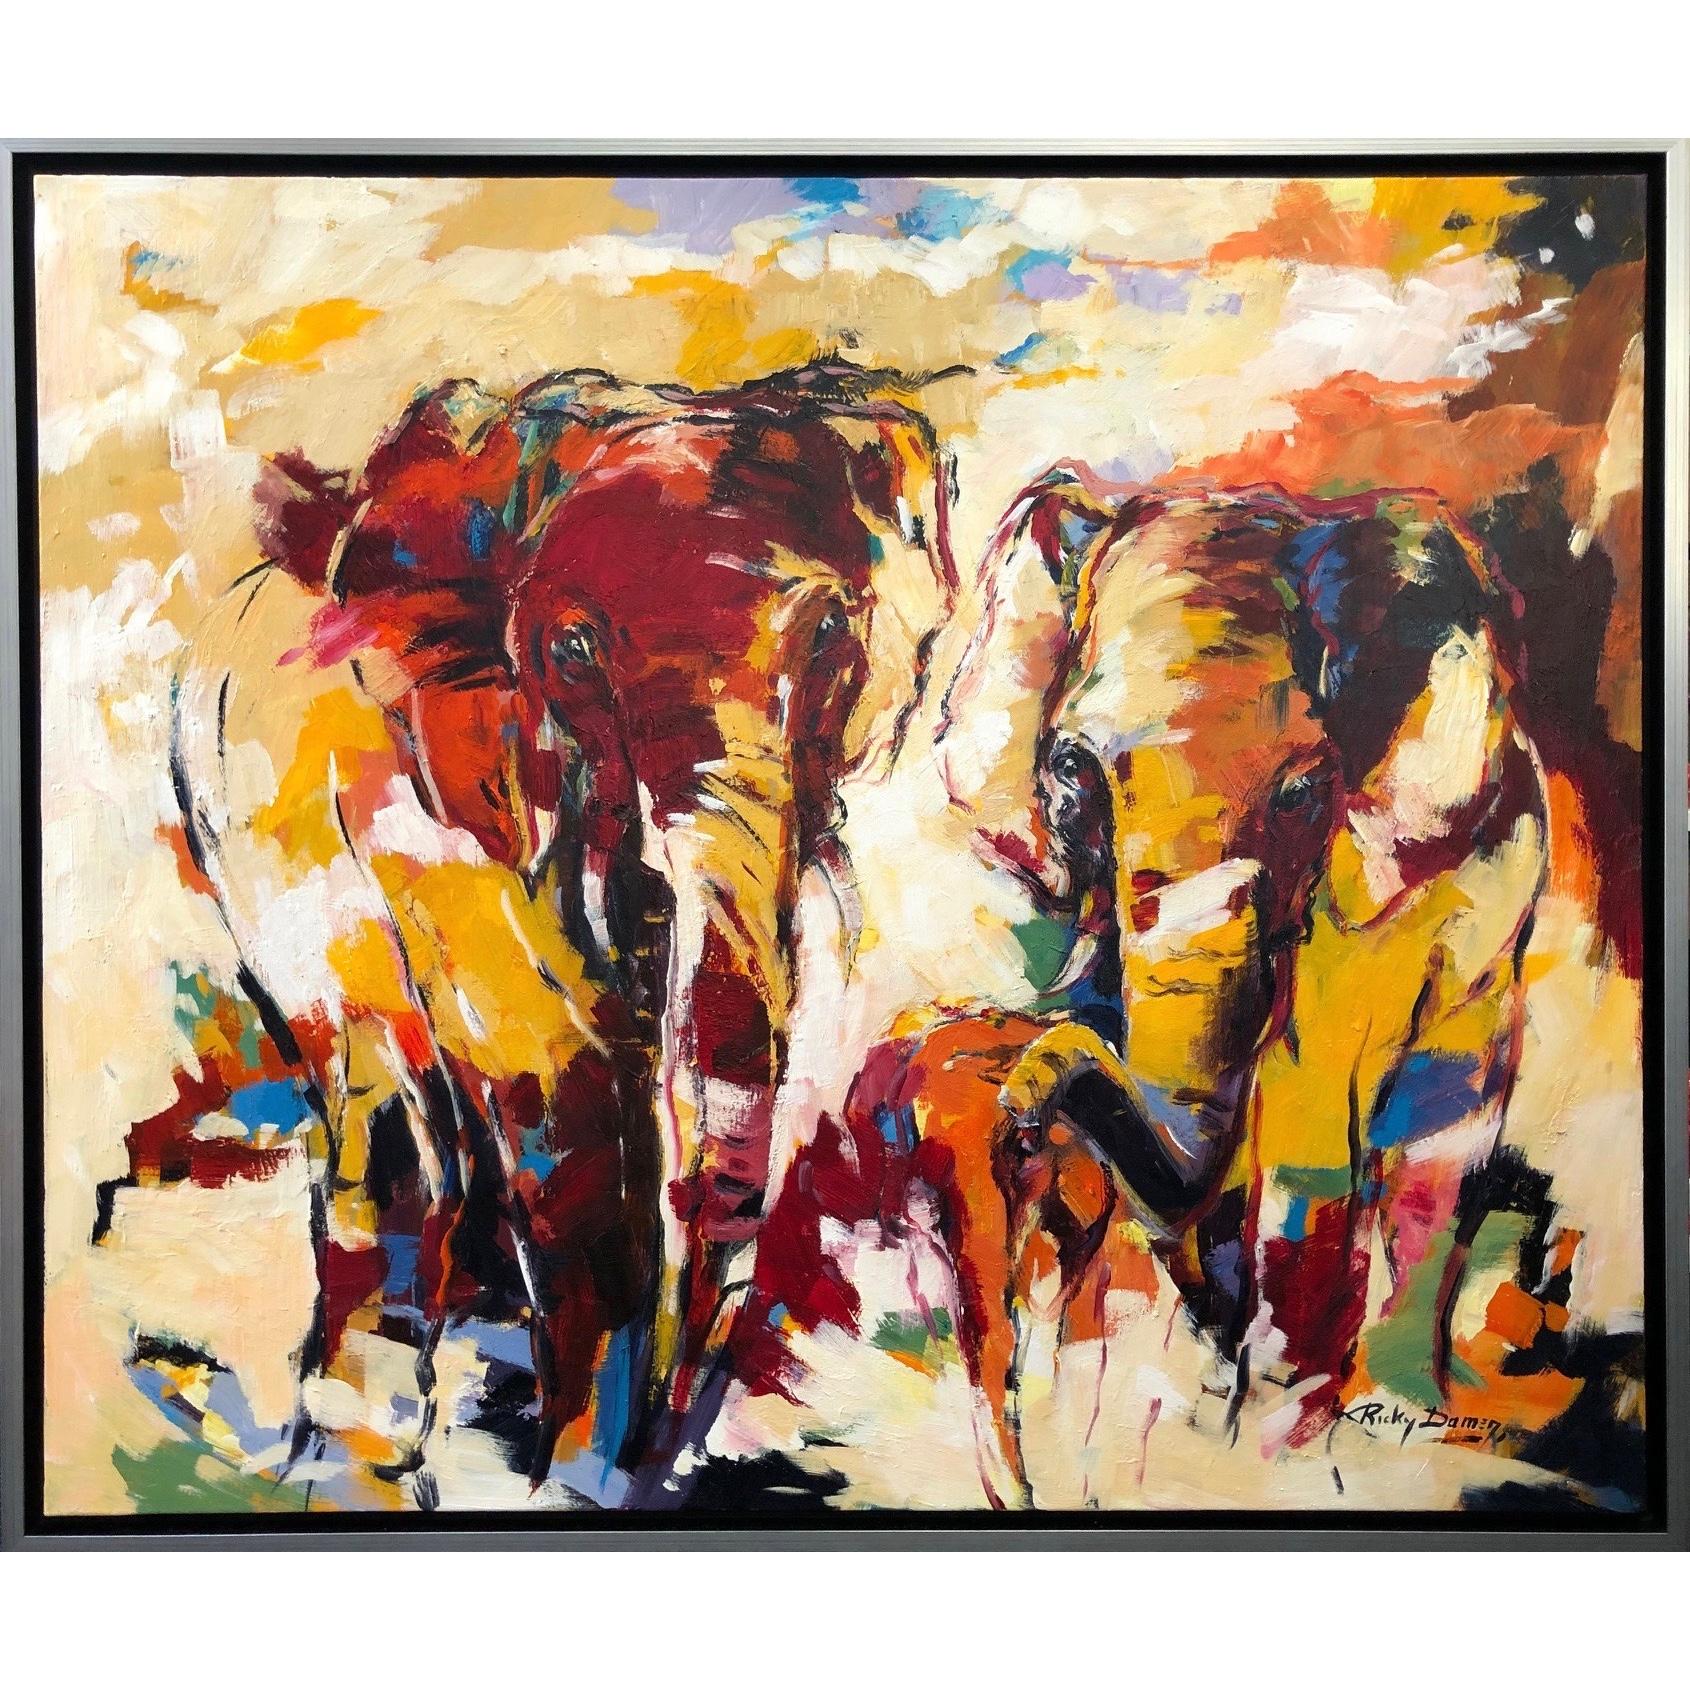 Ricky Damen schilderij 'Colorful Elephants'